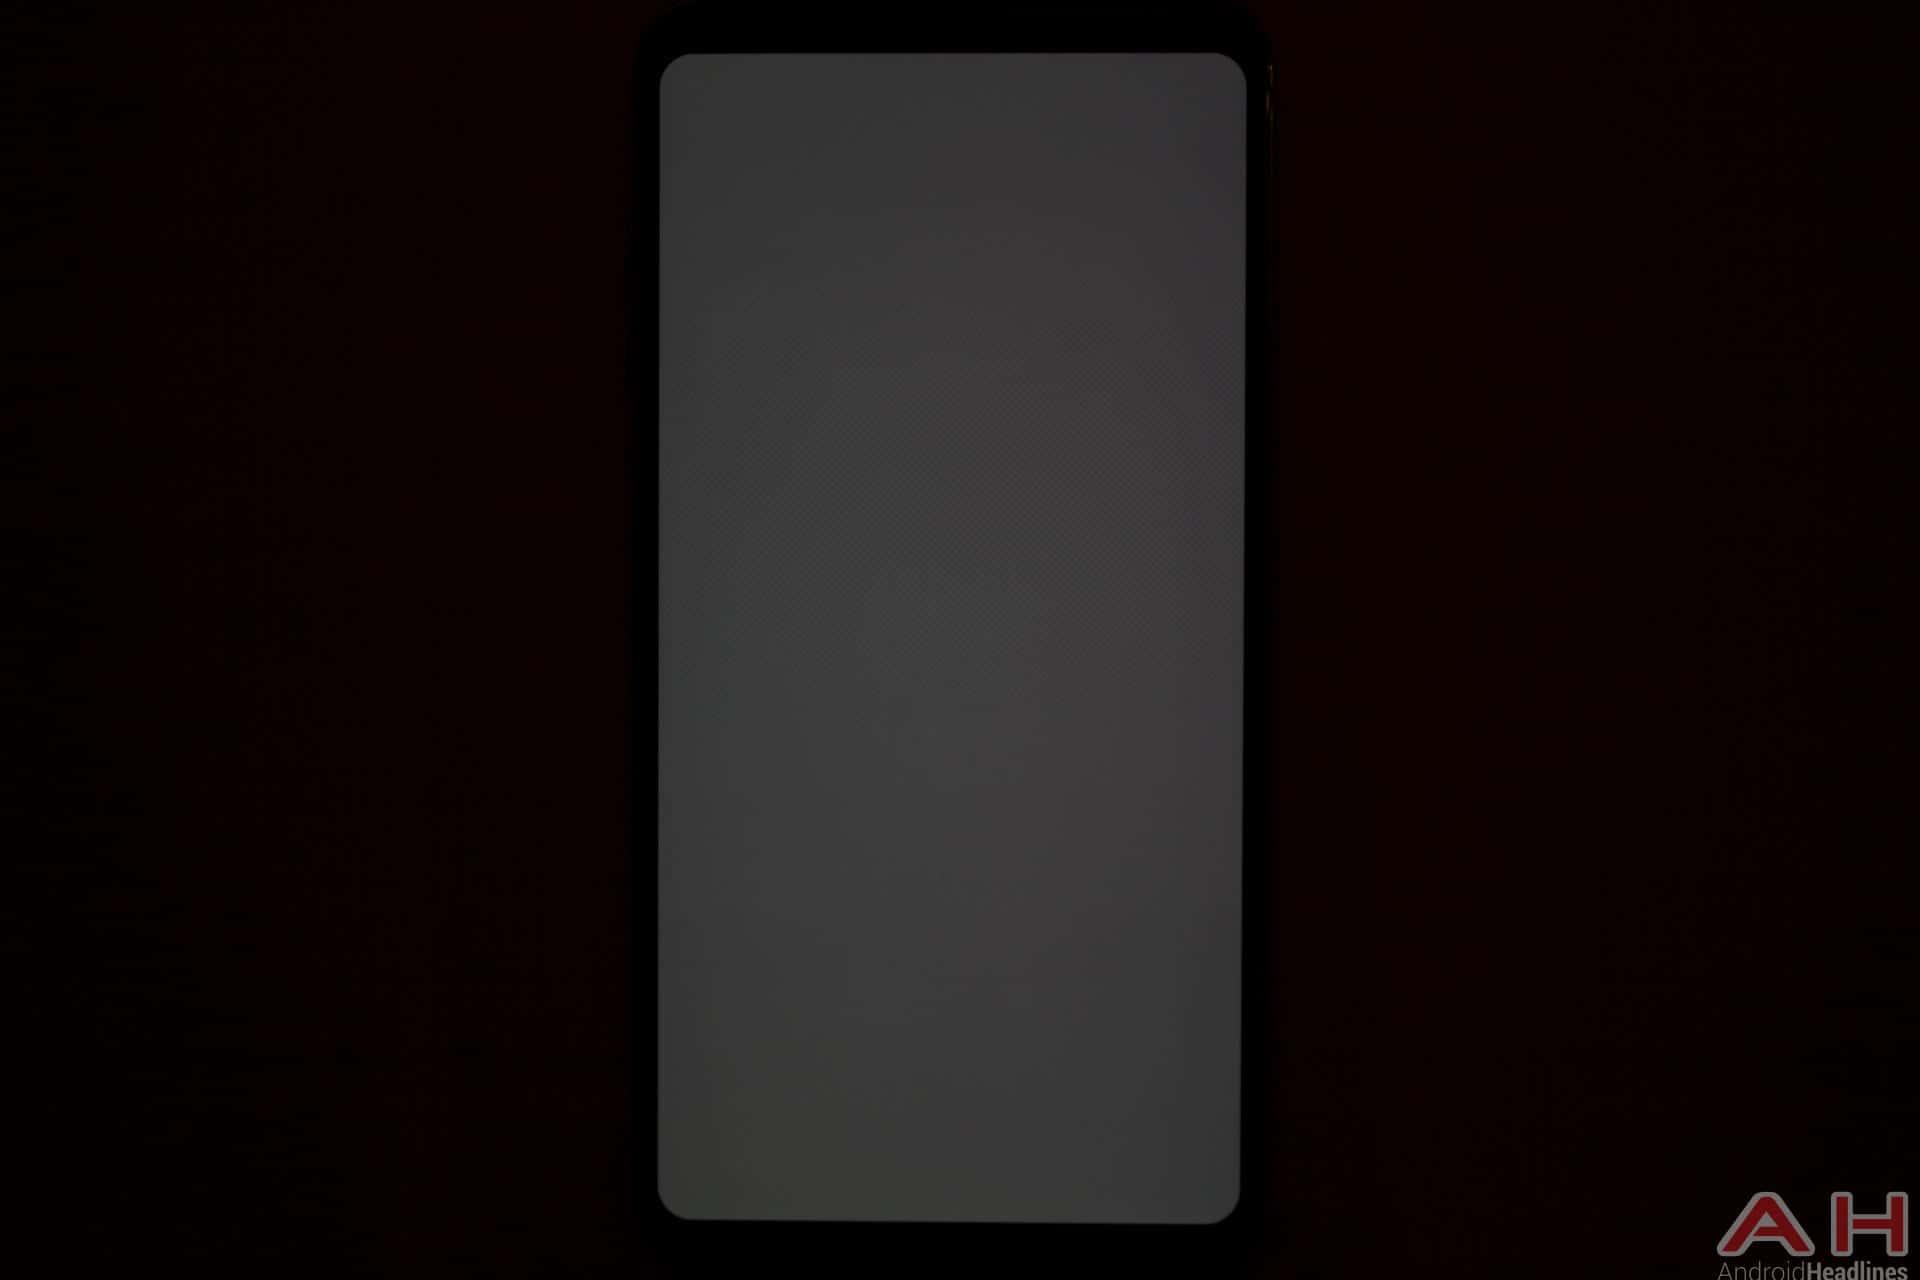 LG V30 AH NS Display Uniformity Grey 100